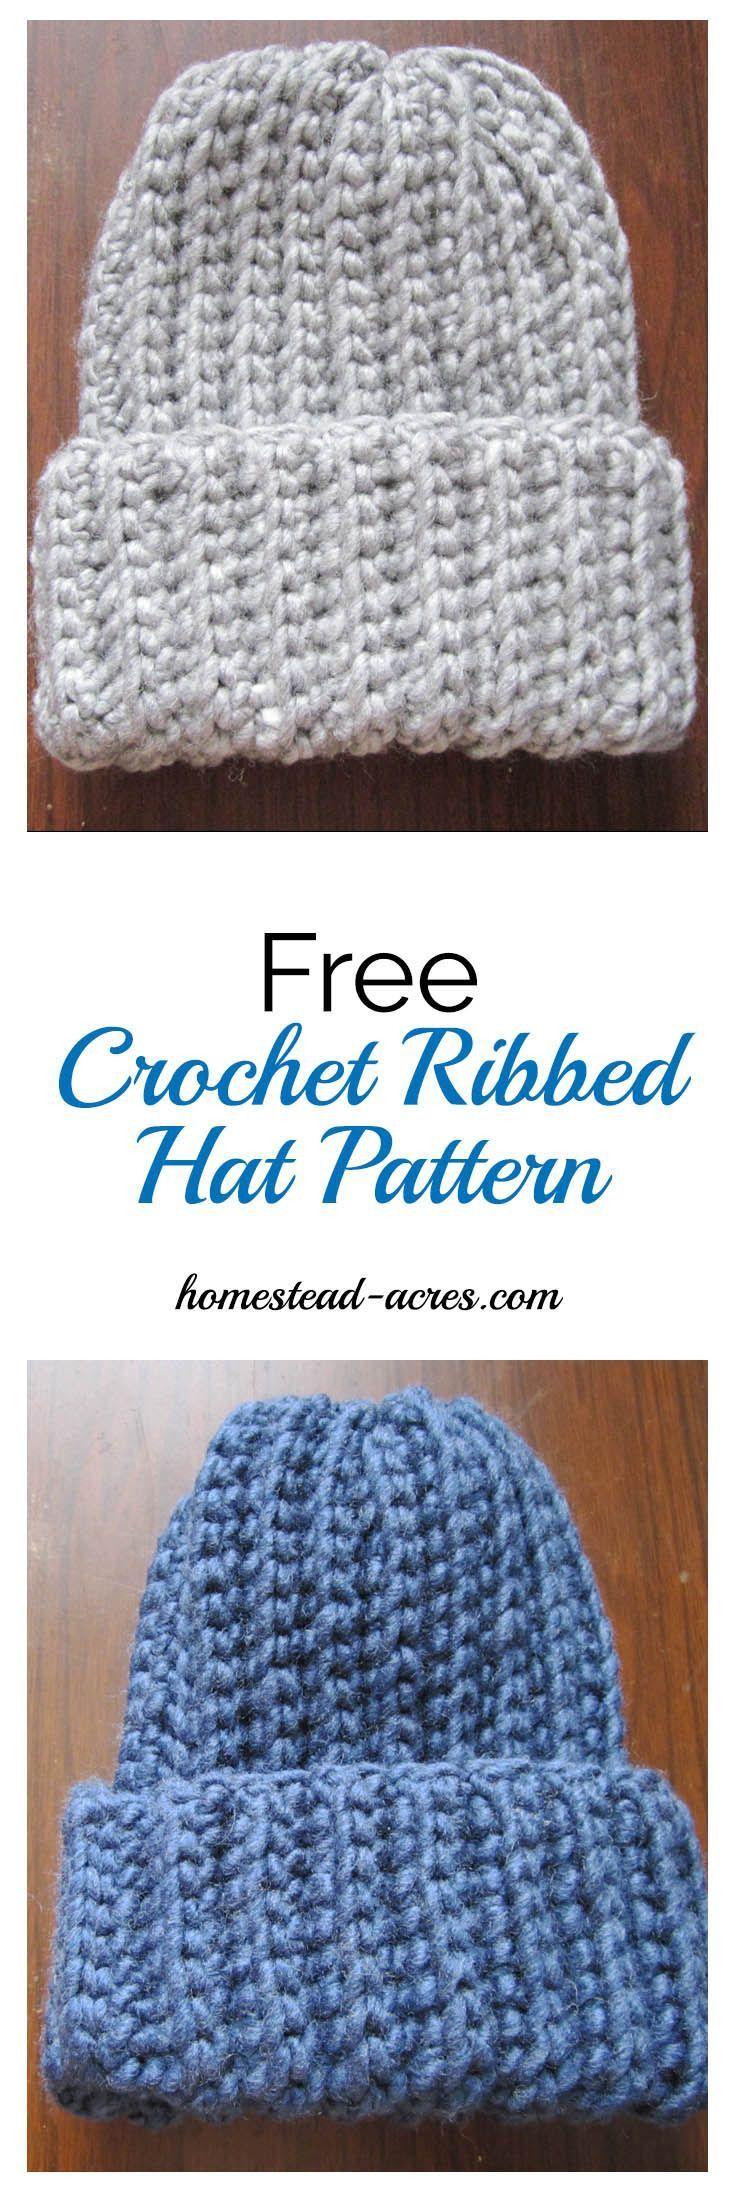 Crochet Ribbed Hat Pattern – Crochet and Knitting Patterns